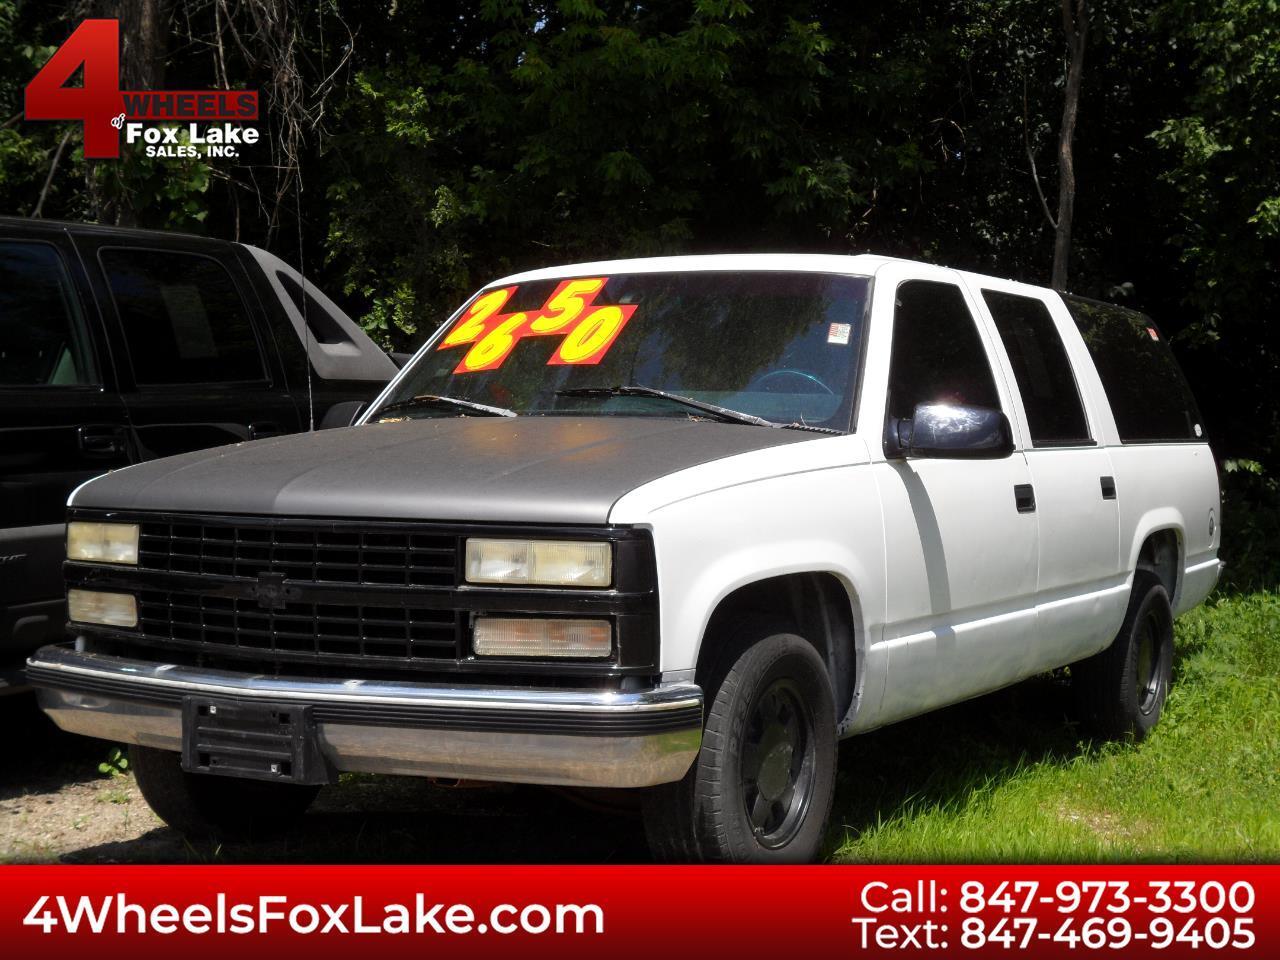 1996 Chevrolet Suburban C1500 2WD